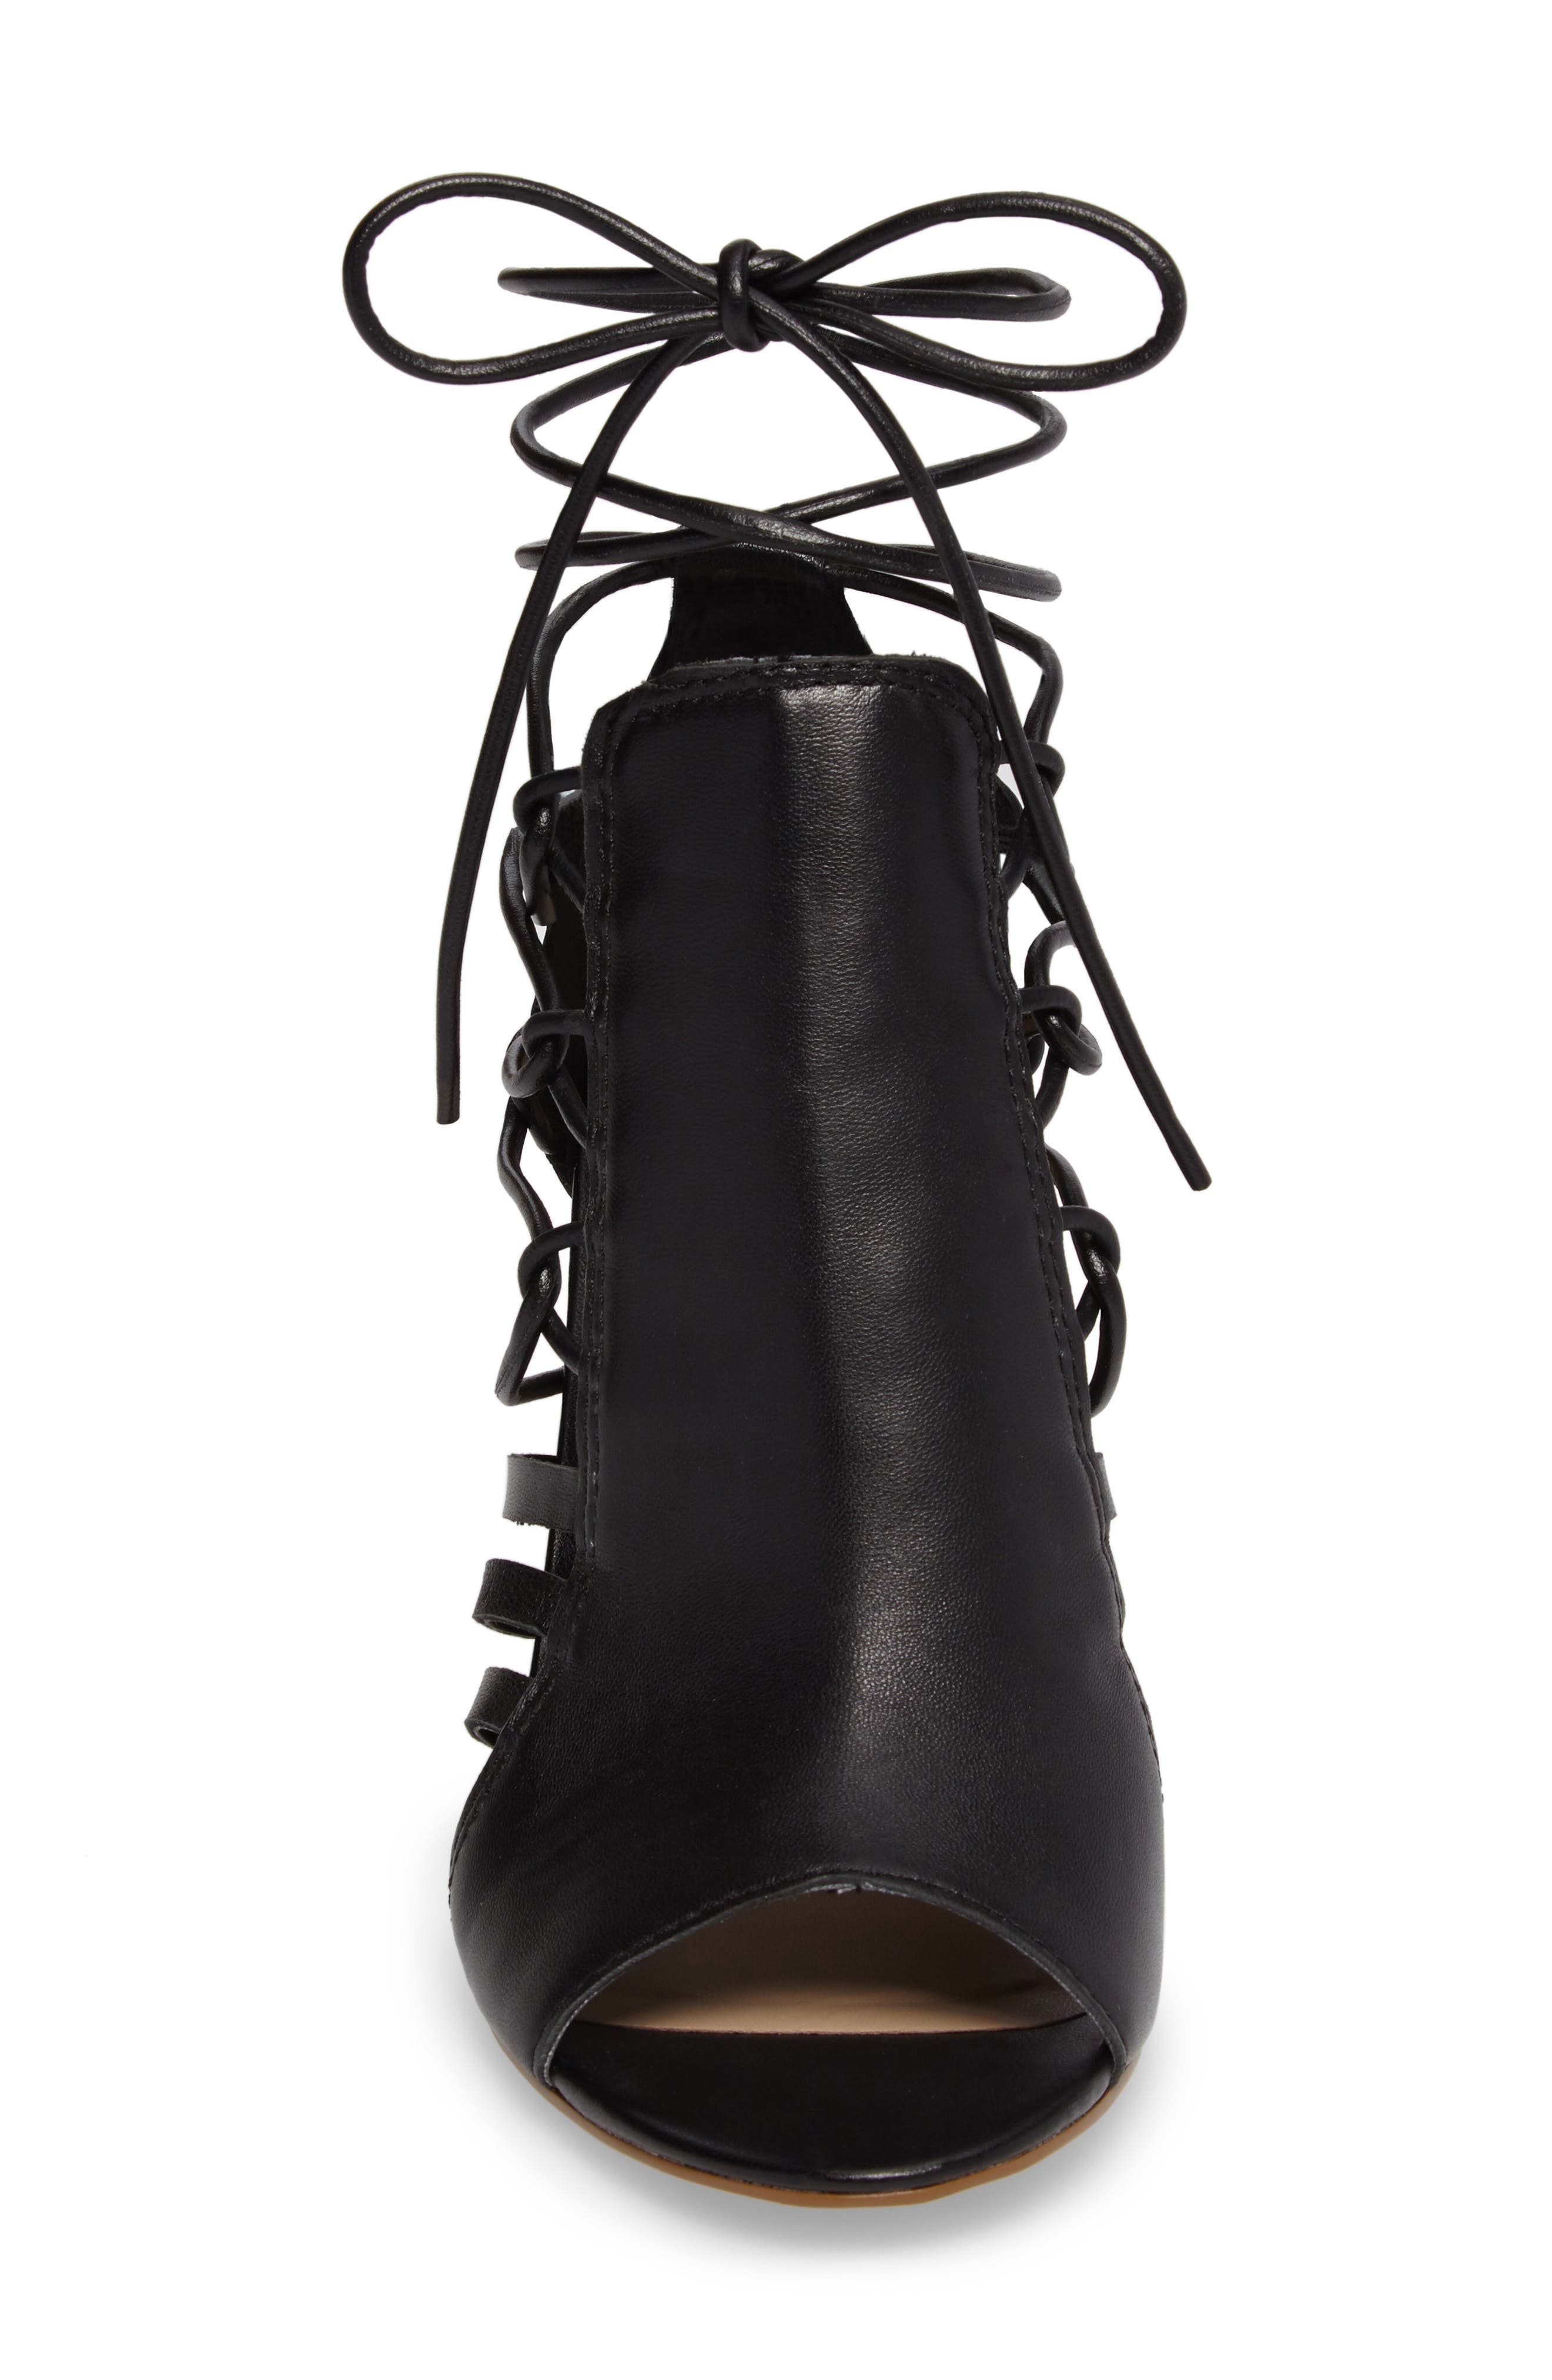 Adette Ankle Tie Sandal,                             Alternate thumbnail 4, color,                             001